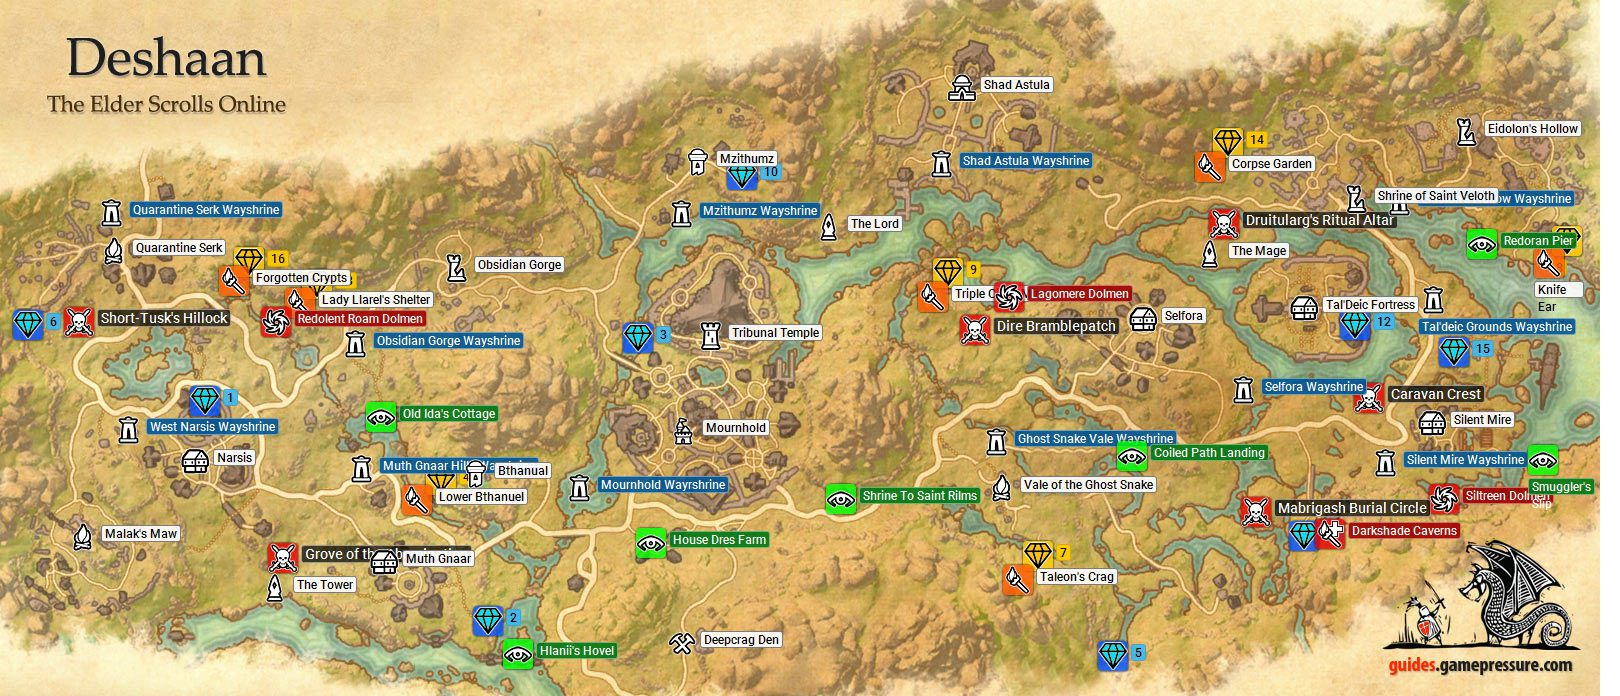 ... Pact - The Elder Scrolls Online Game Guide   gamepressure.com